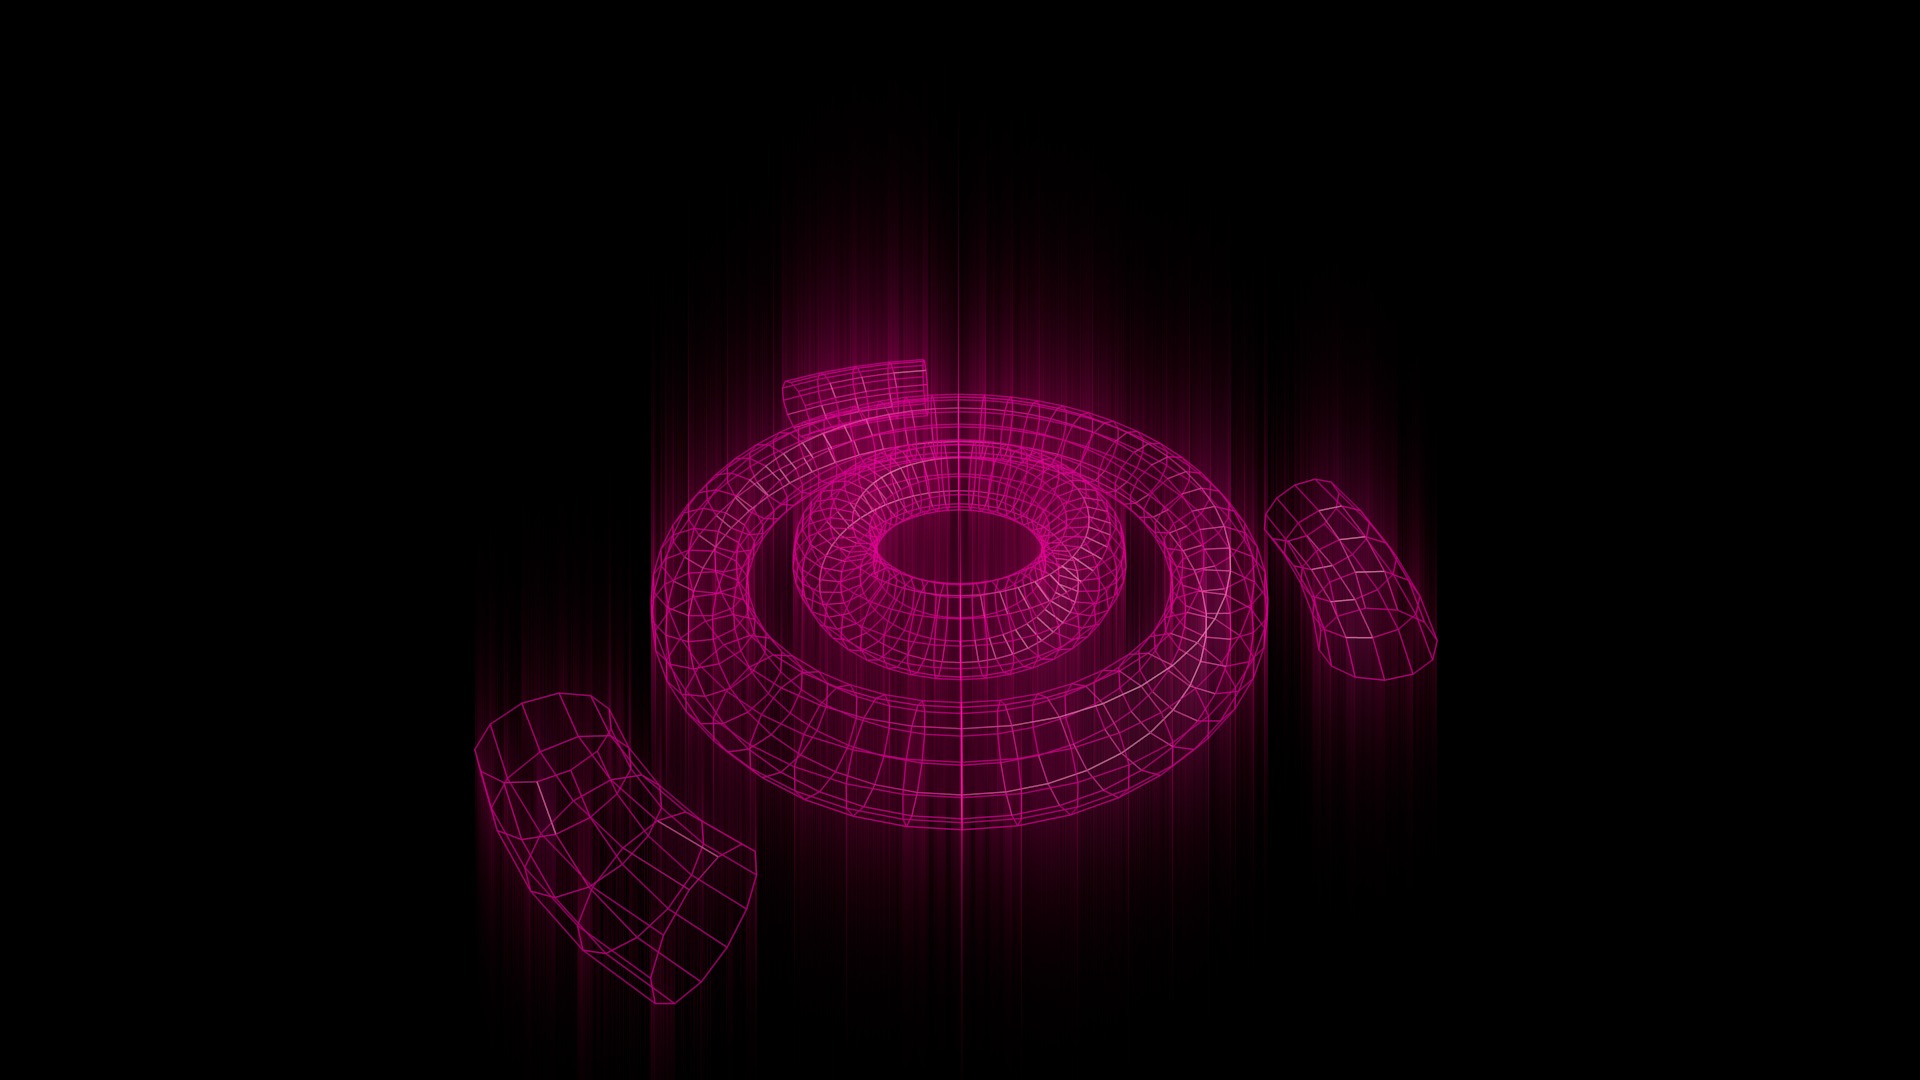 Ubuntu purple glaring logo by Phen0m77